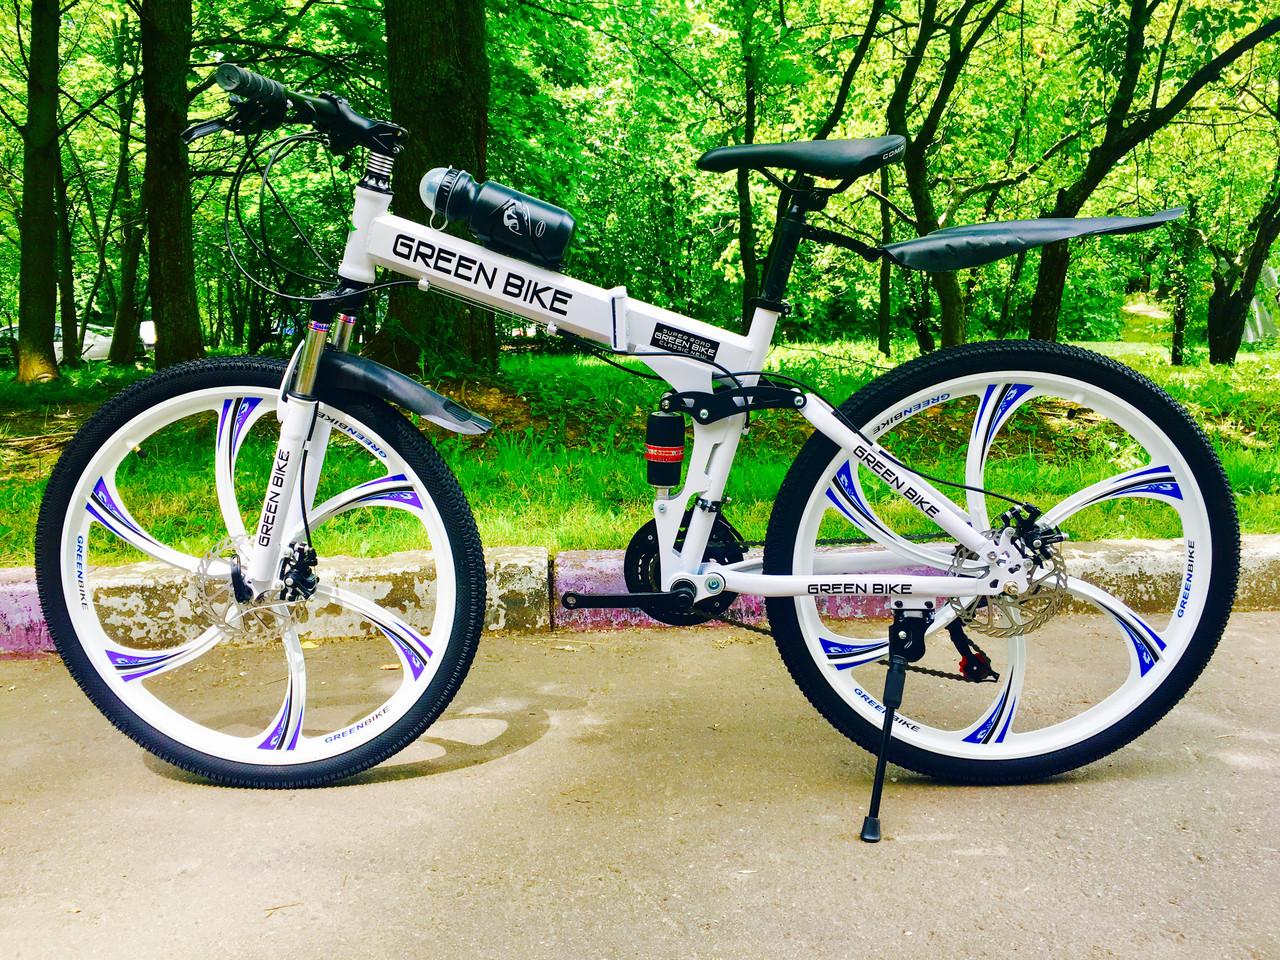 Green bike велосипед на литых дисках